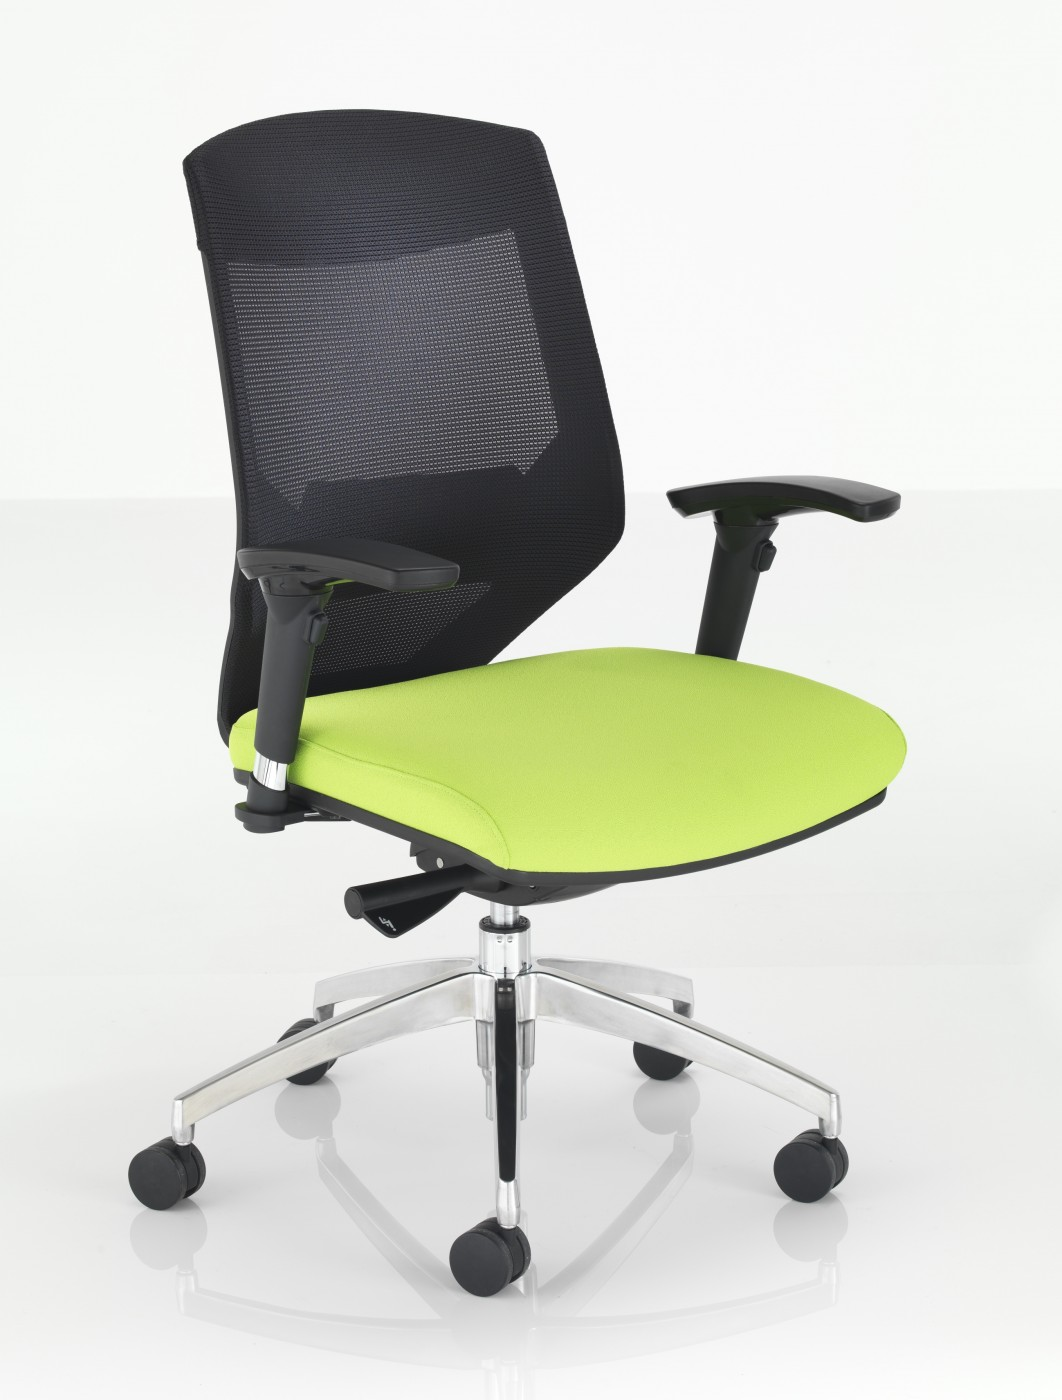 throne office chair cover rentals west palm beach chairs tc vogue mesh ch2622bk 121